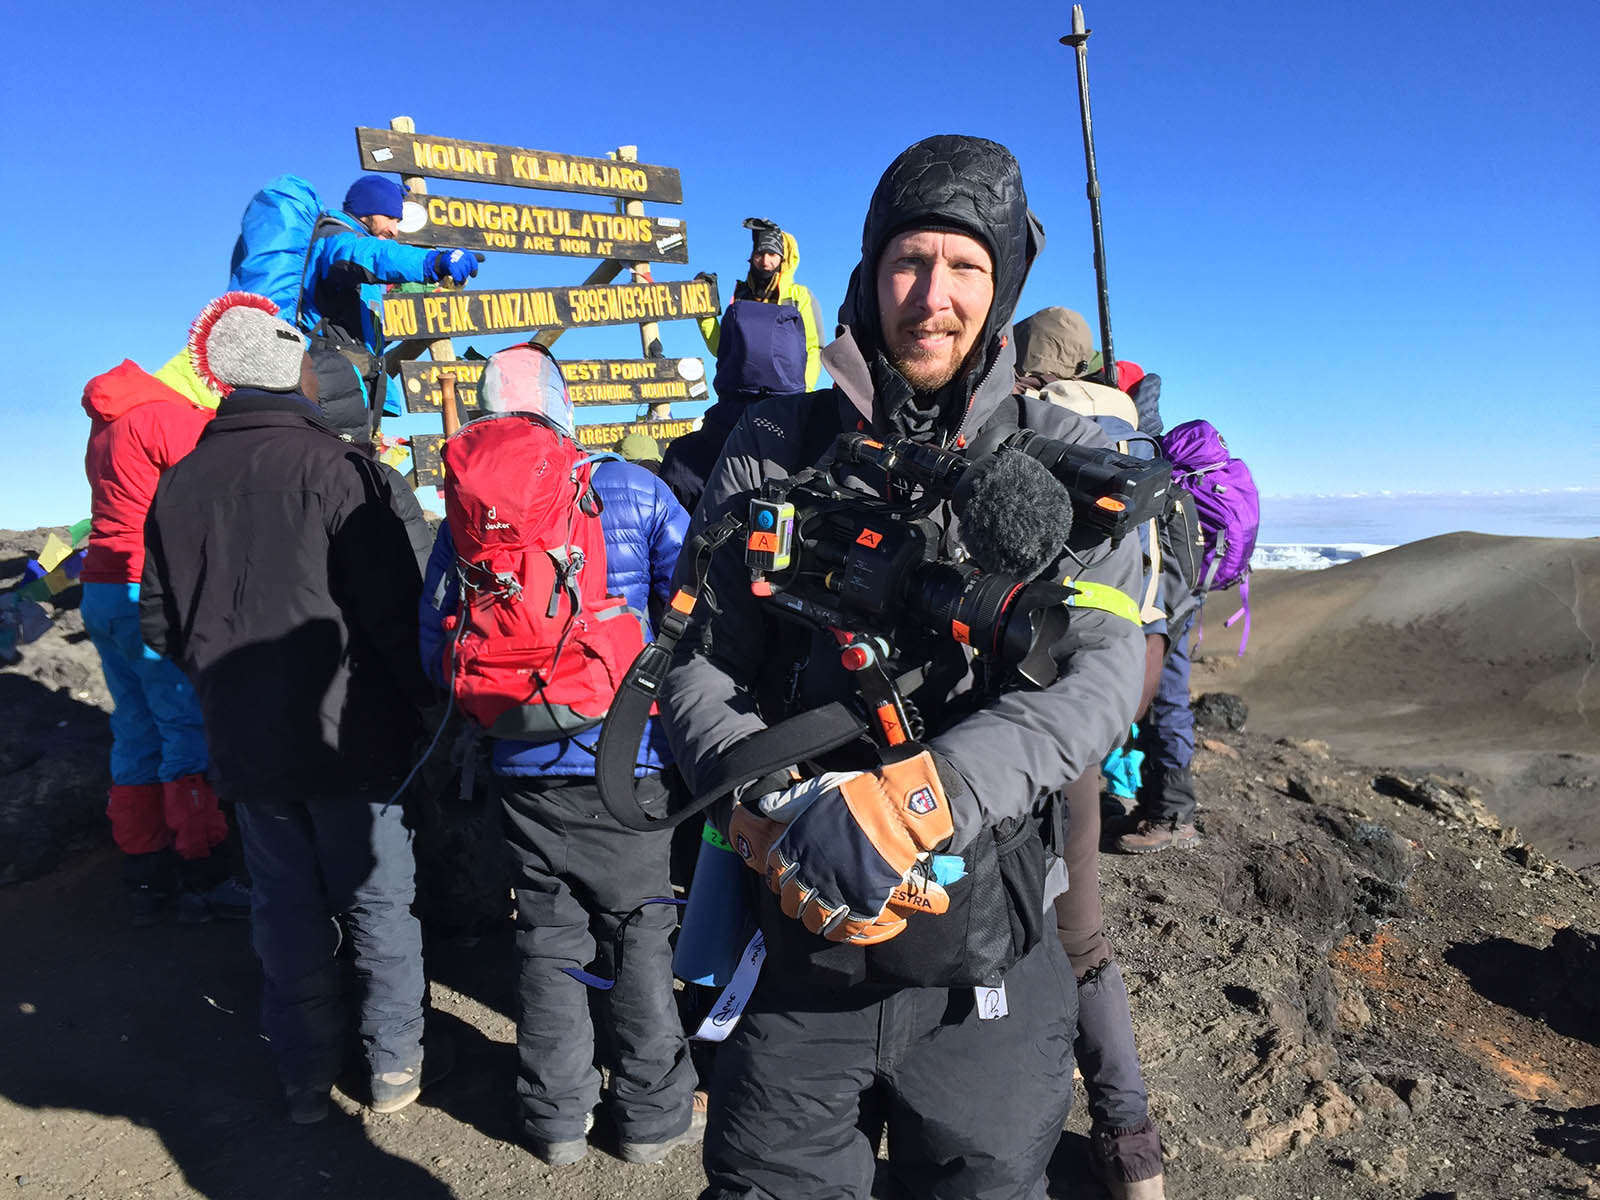 I made it! Kilimanjaro!!